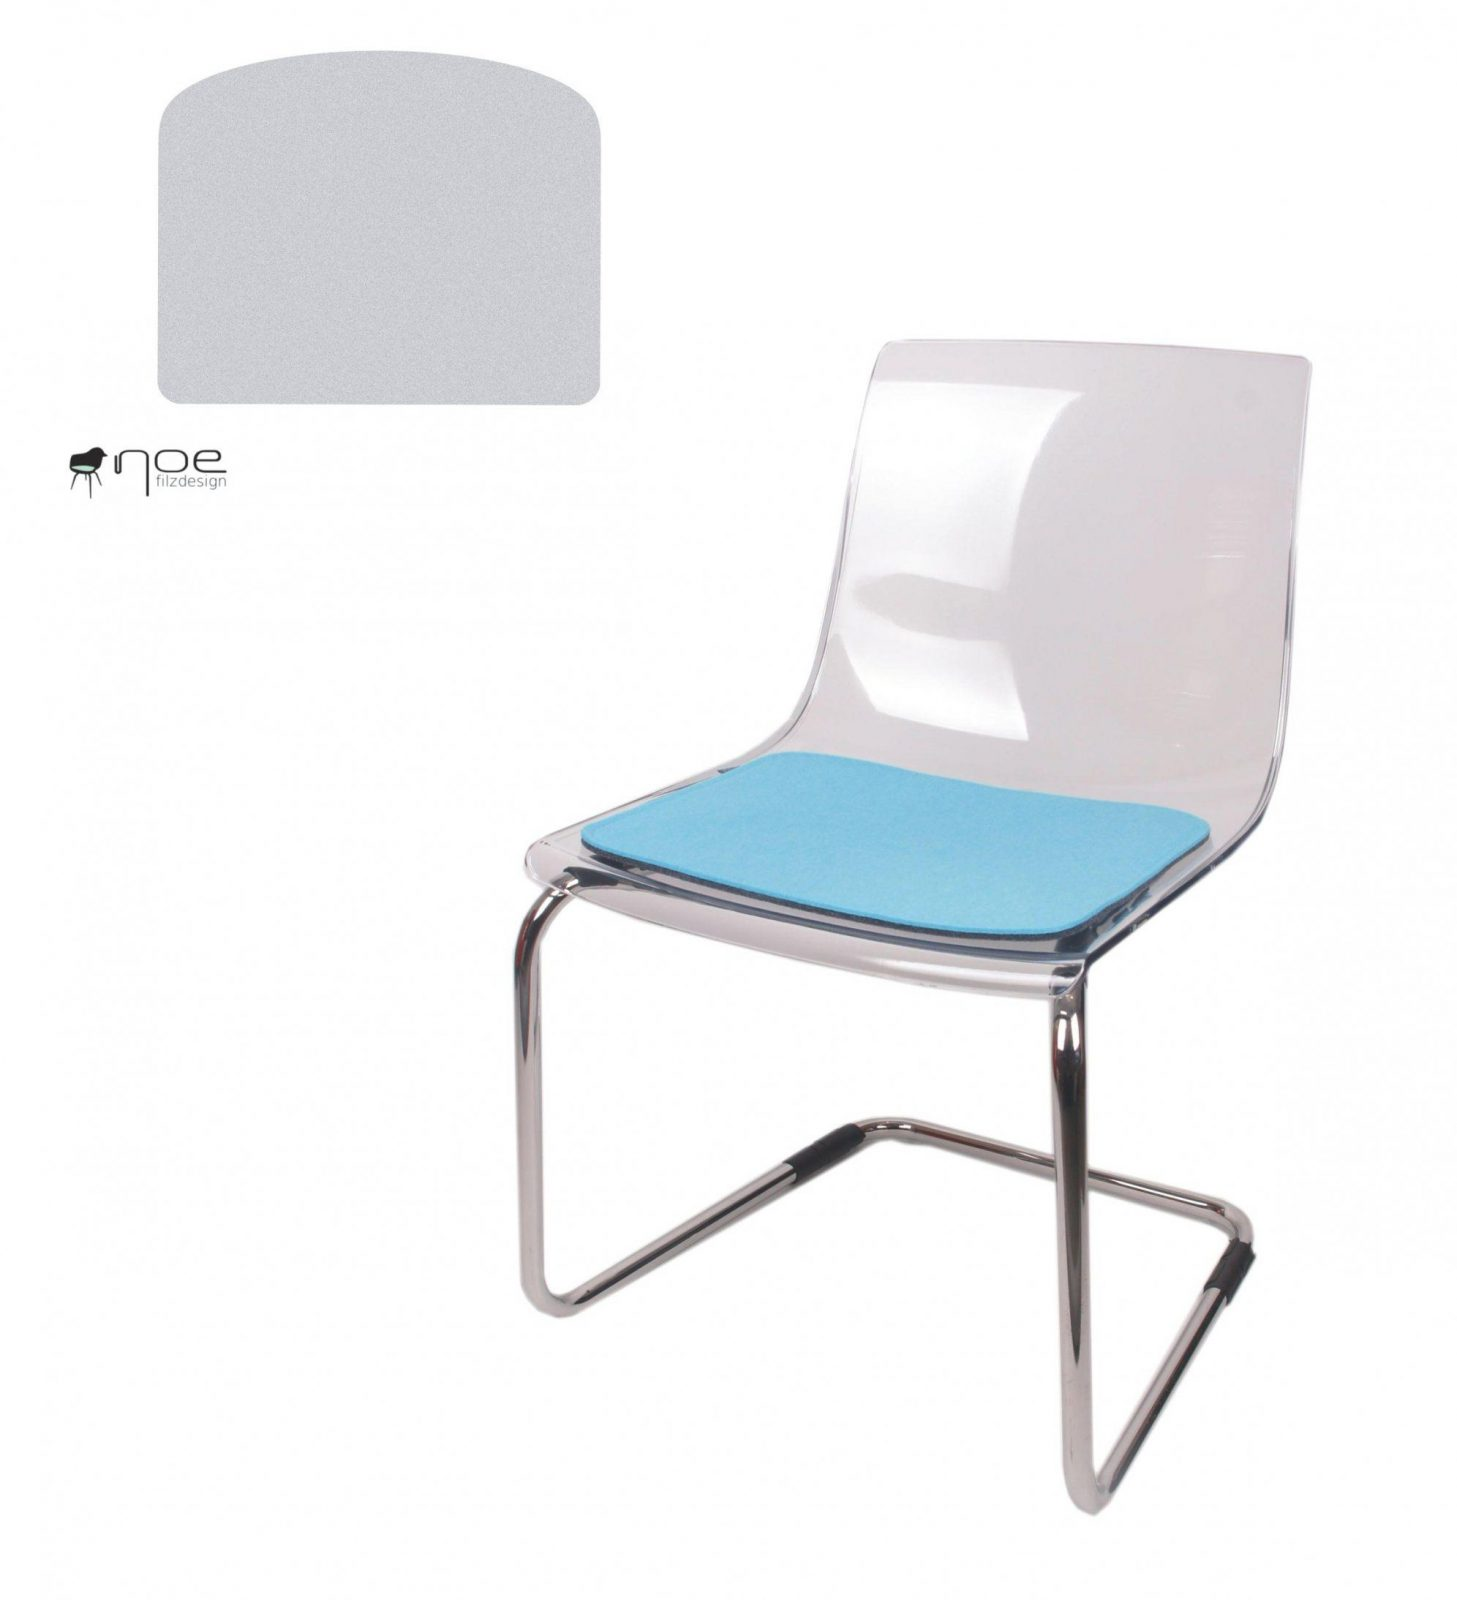 Schreibtischstuhl Ohne Rollen Ikea Elegant Konferenzstuhl Ikea von Schreibtischstuhl Ohne Rollen Ikea Photo